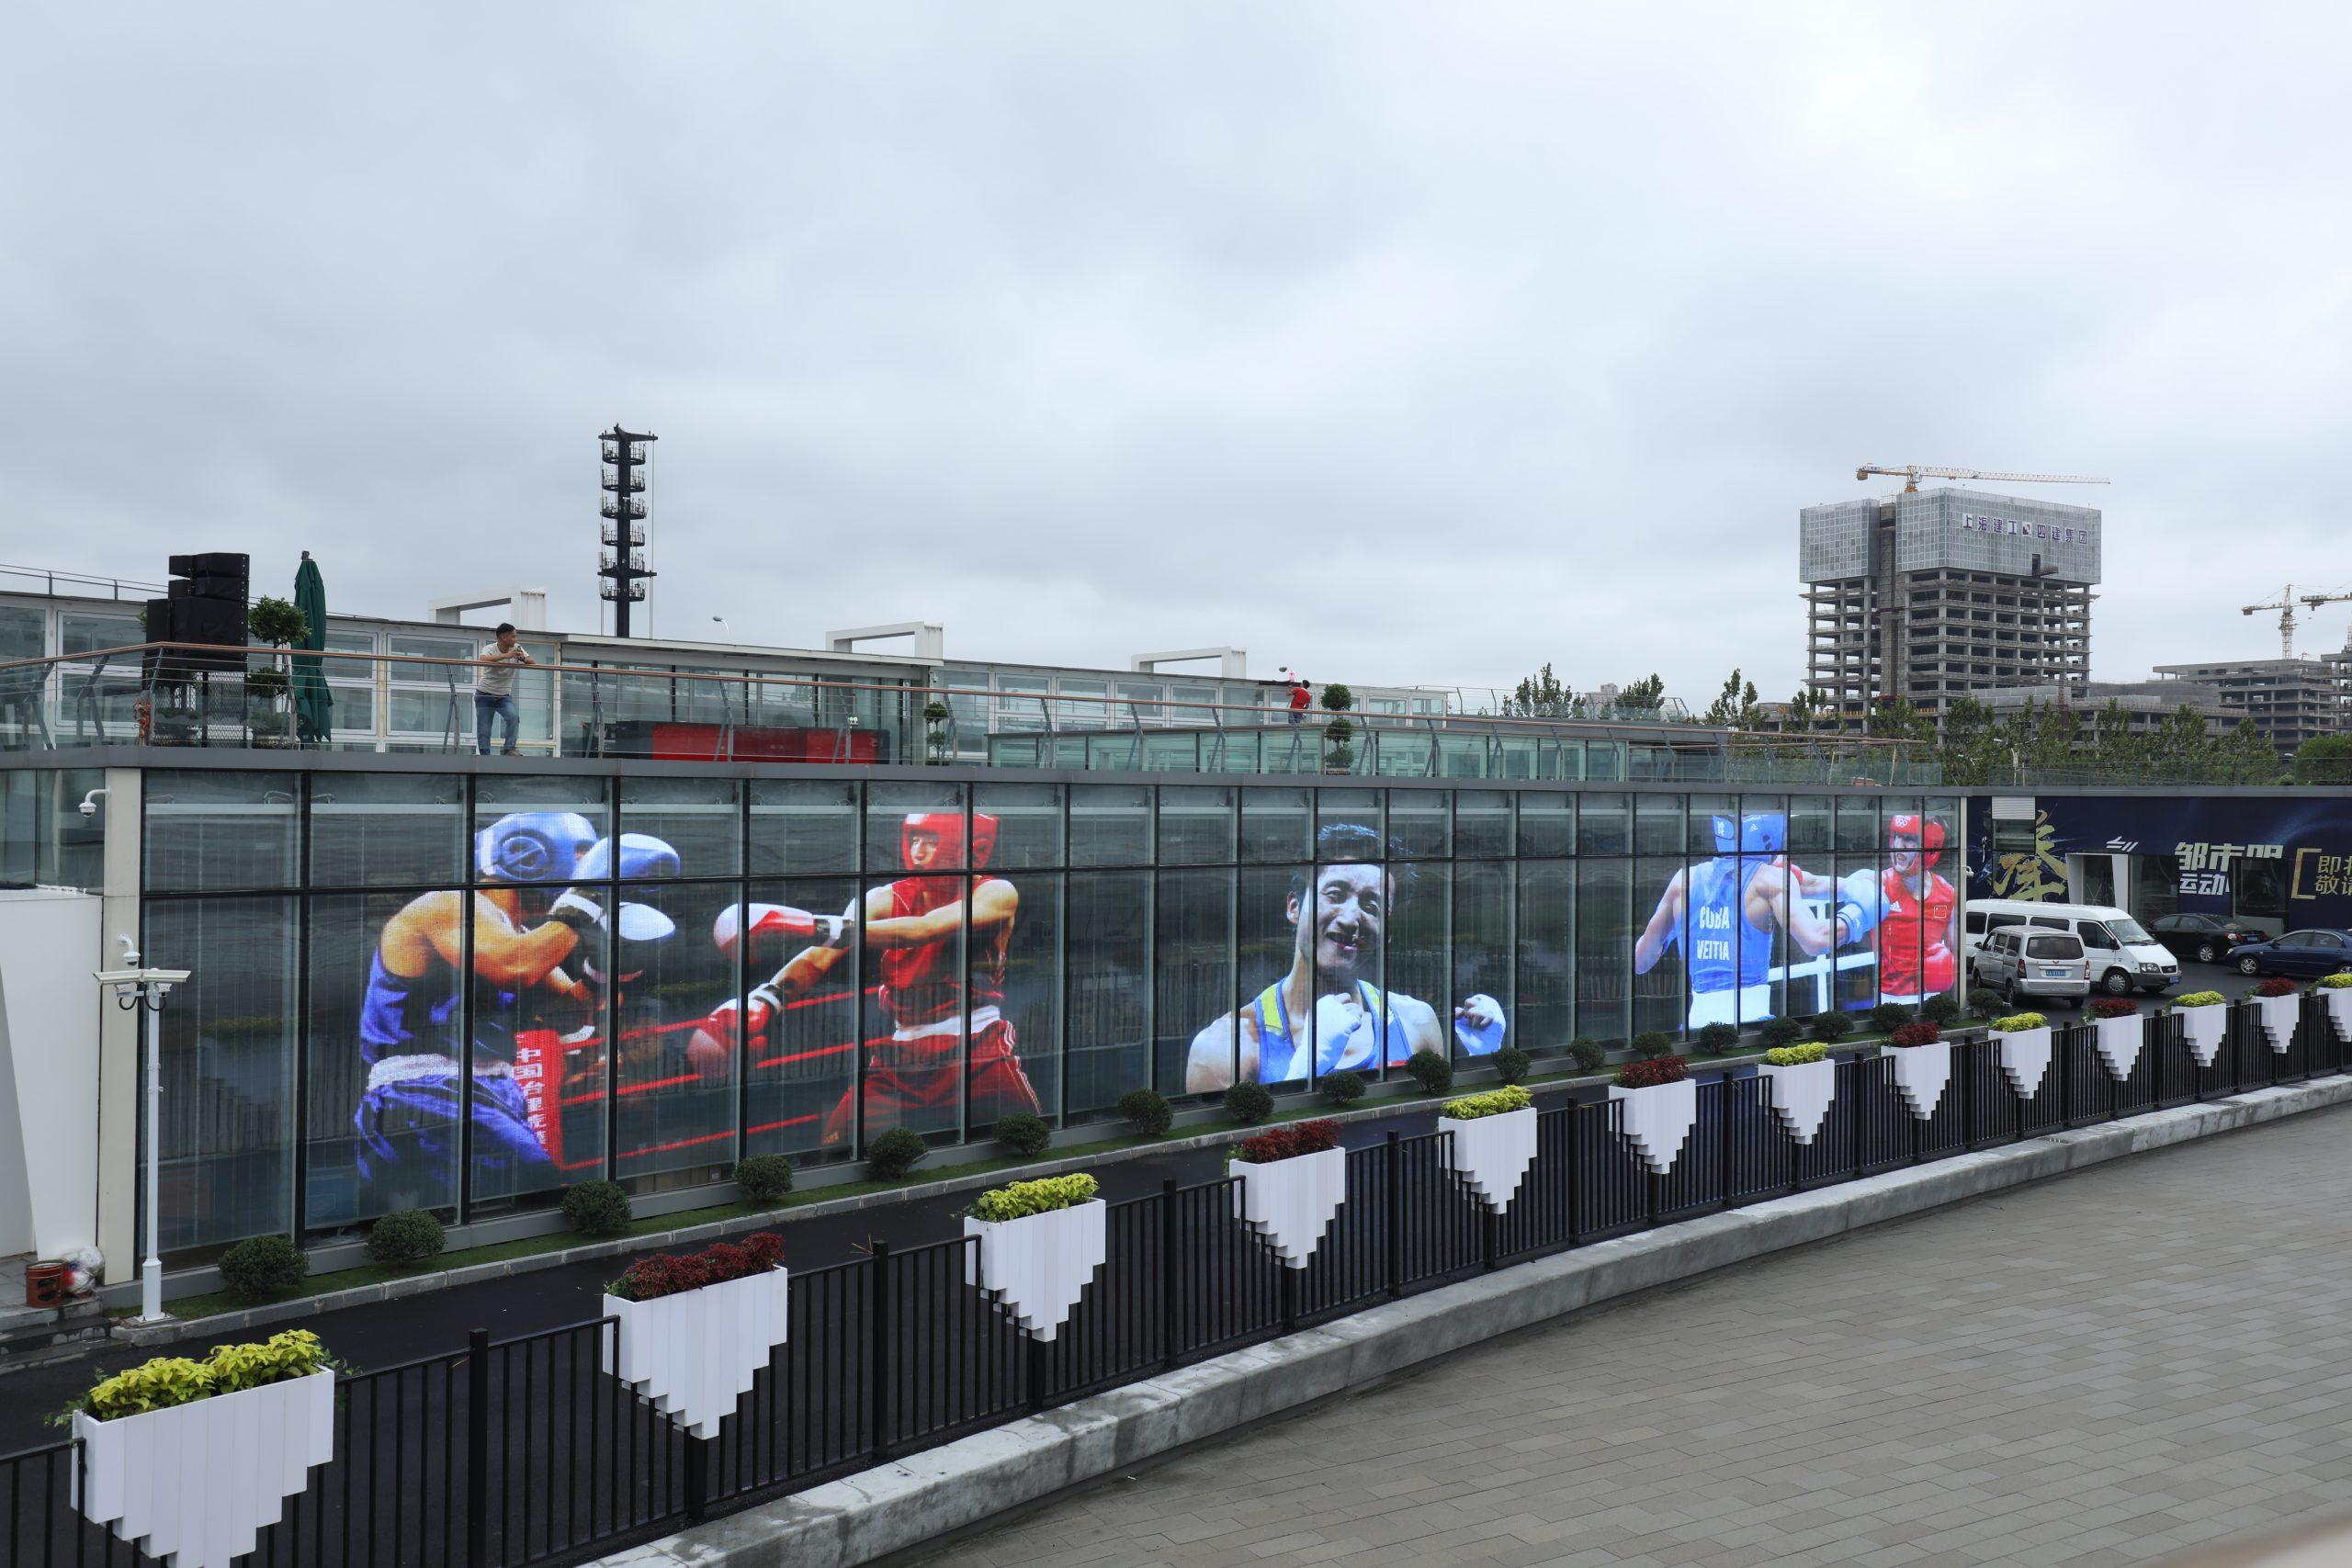 Boxing stadium- Standard transparent LED